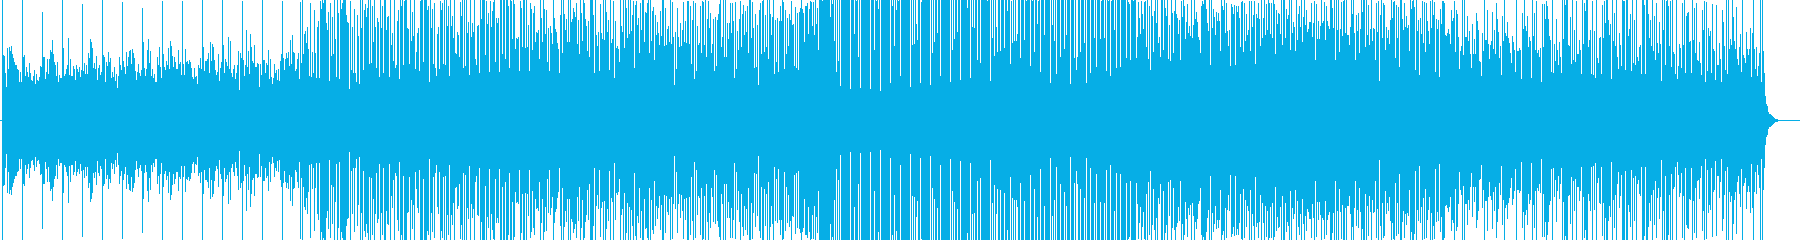 ■PV-IT-浮遊-デジタル-ニュースの再生済みの波形